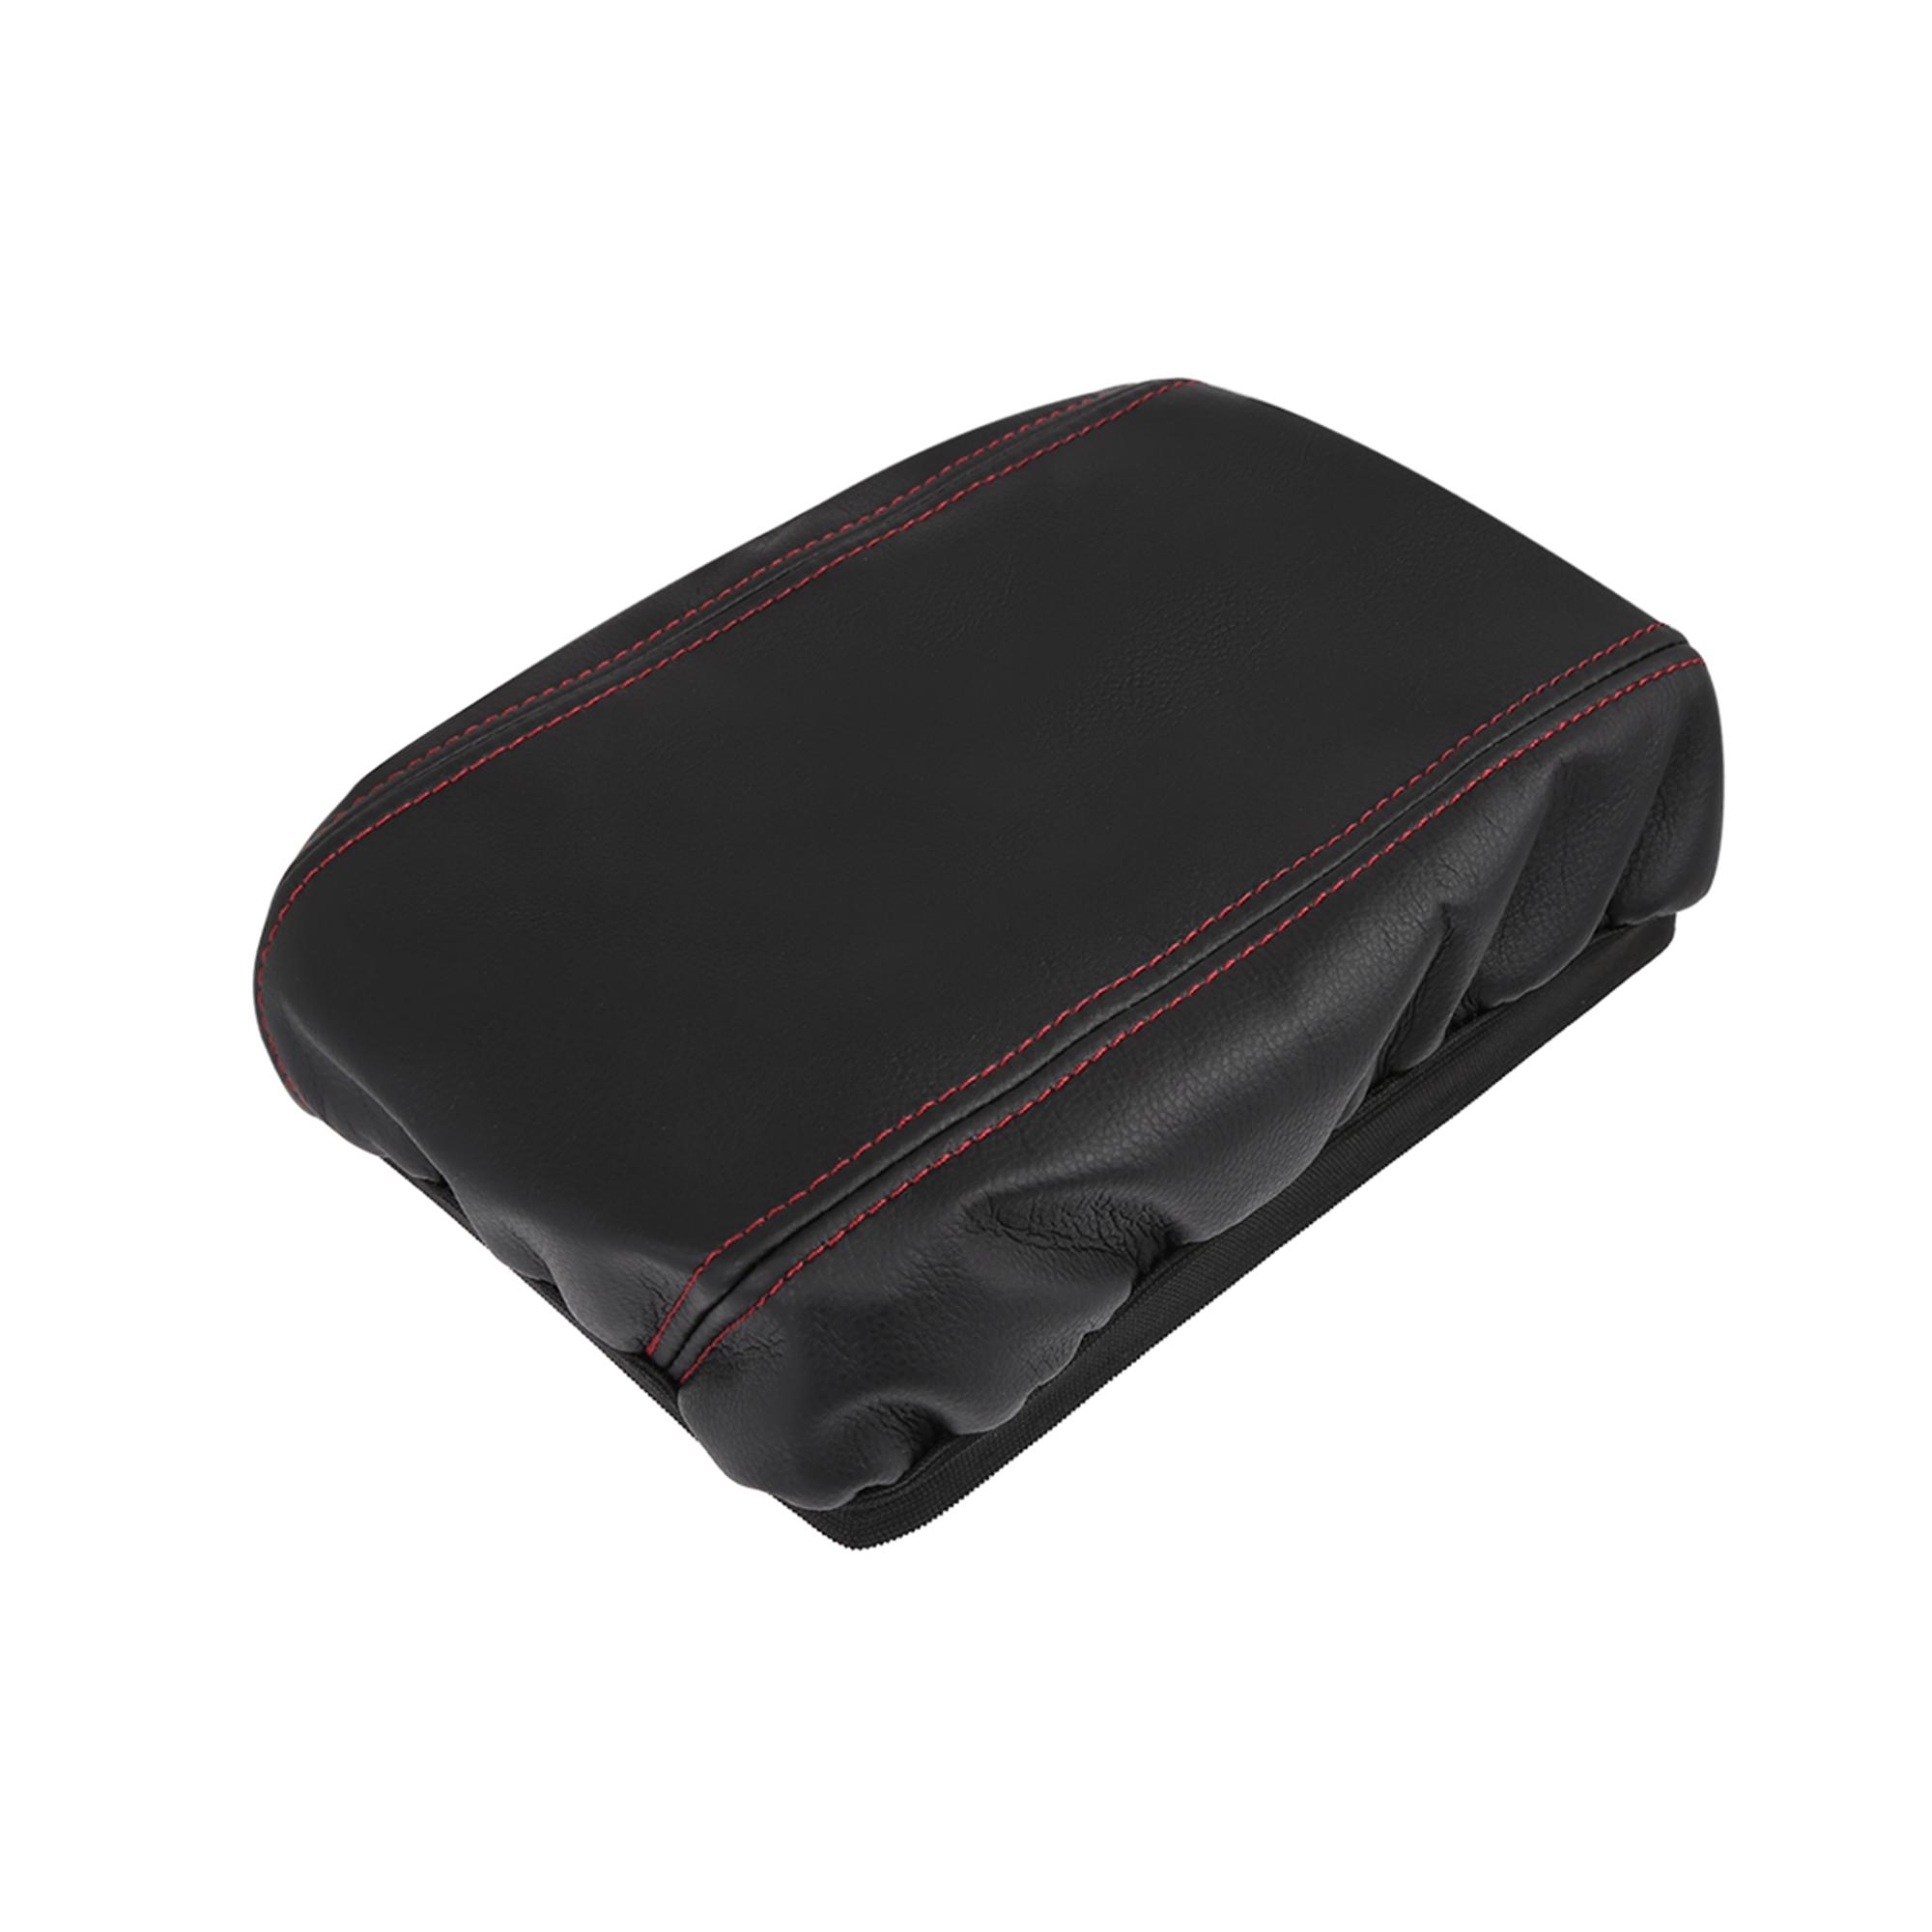 Microfiber Leather Center Console Lid Armrest Cover Skin for 07-11 Honda Civic